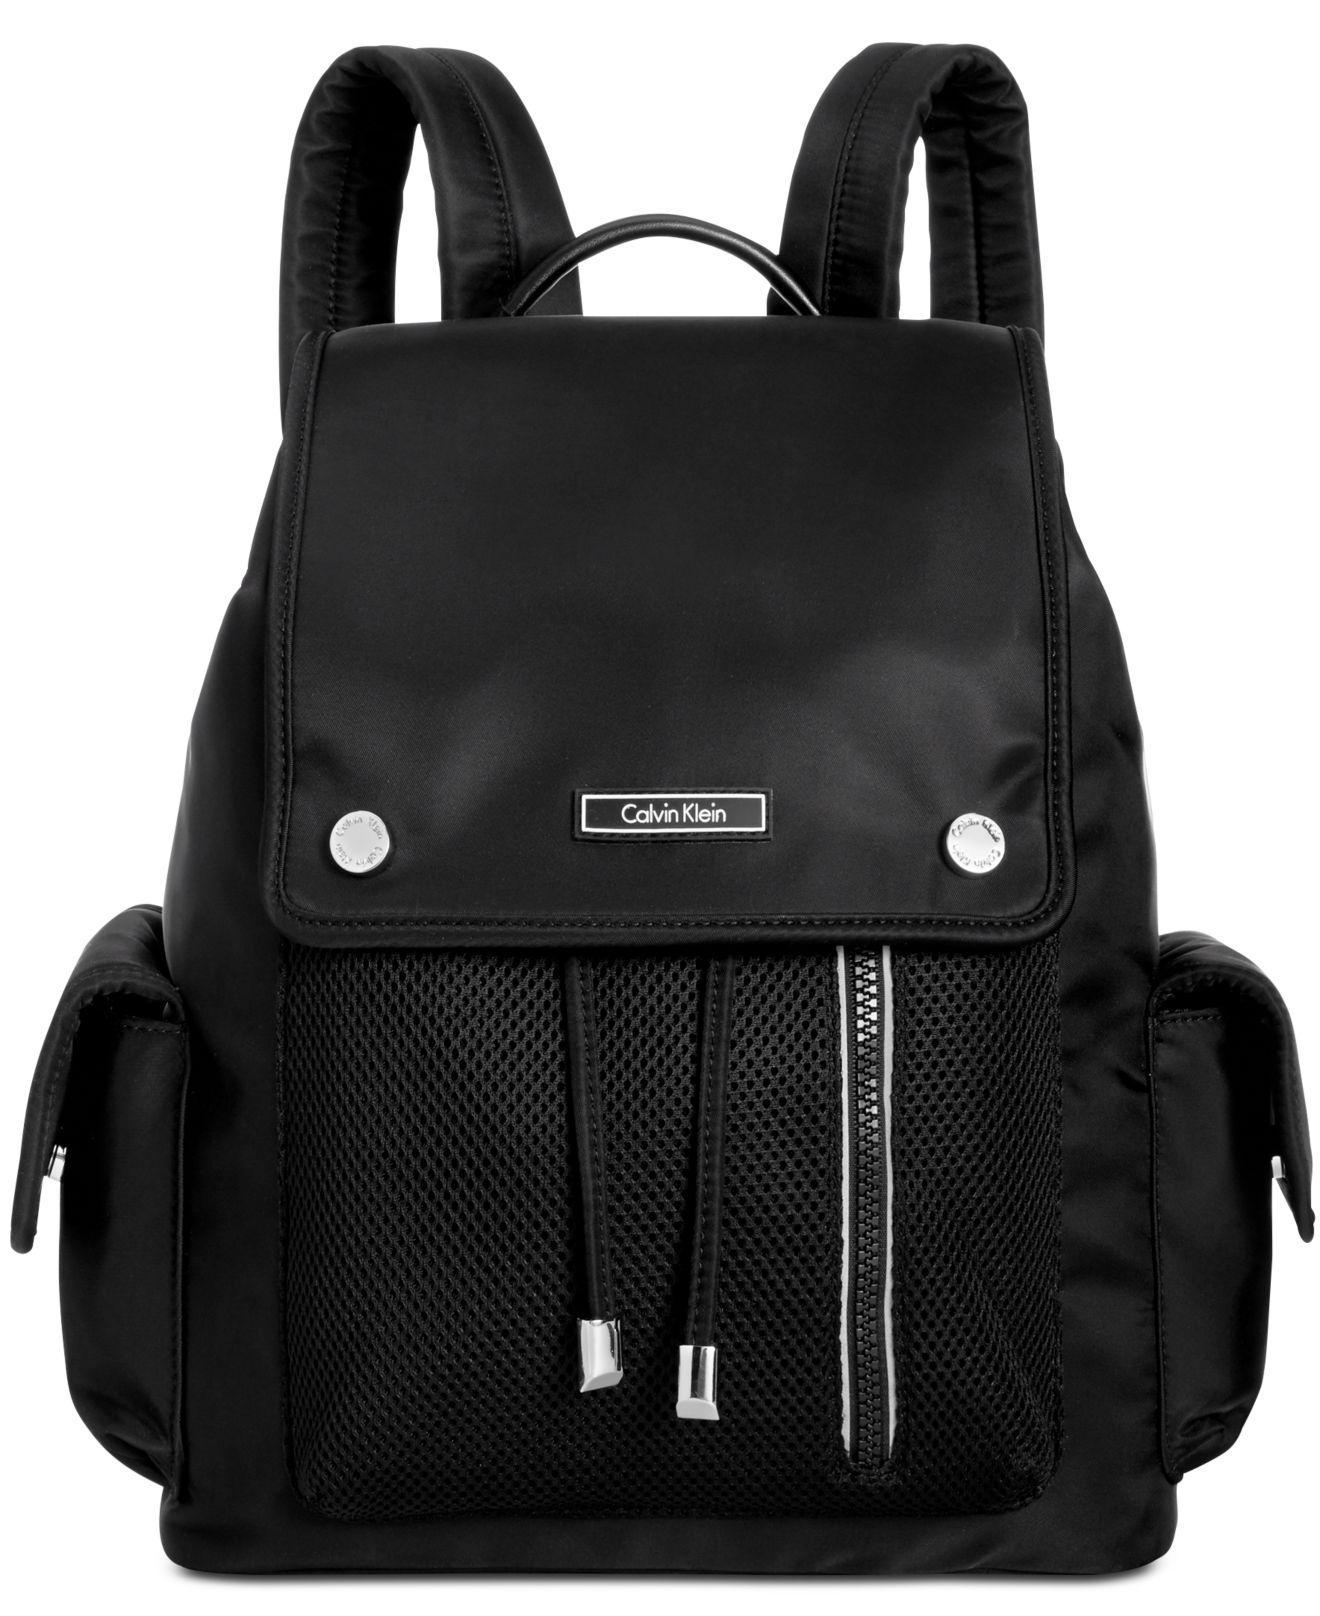 b298bee9a7ba Calvin Klein - Black Athleisure Medium Backpack - Lyst. View fullscreen